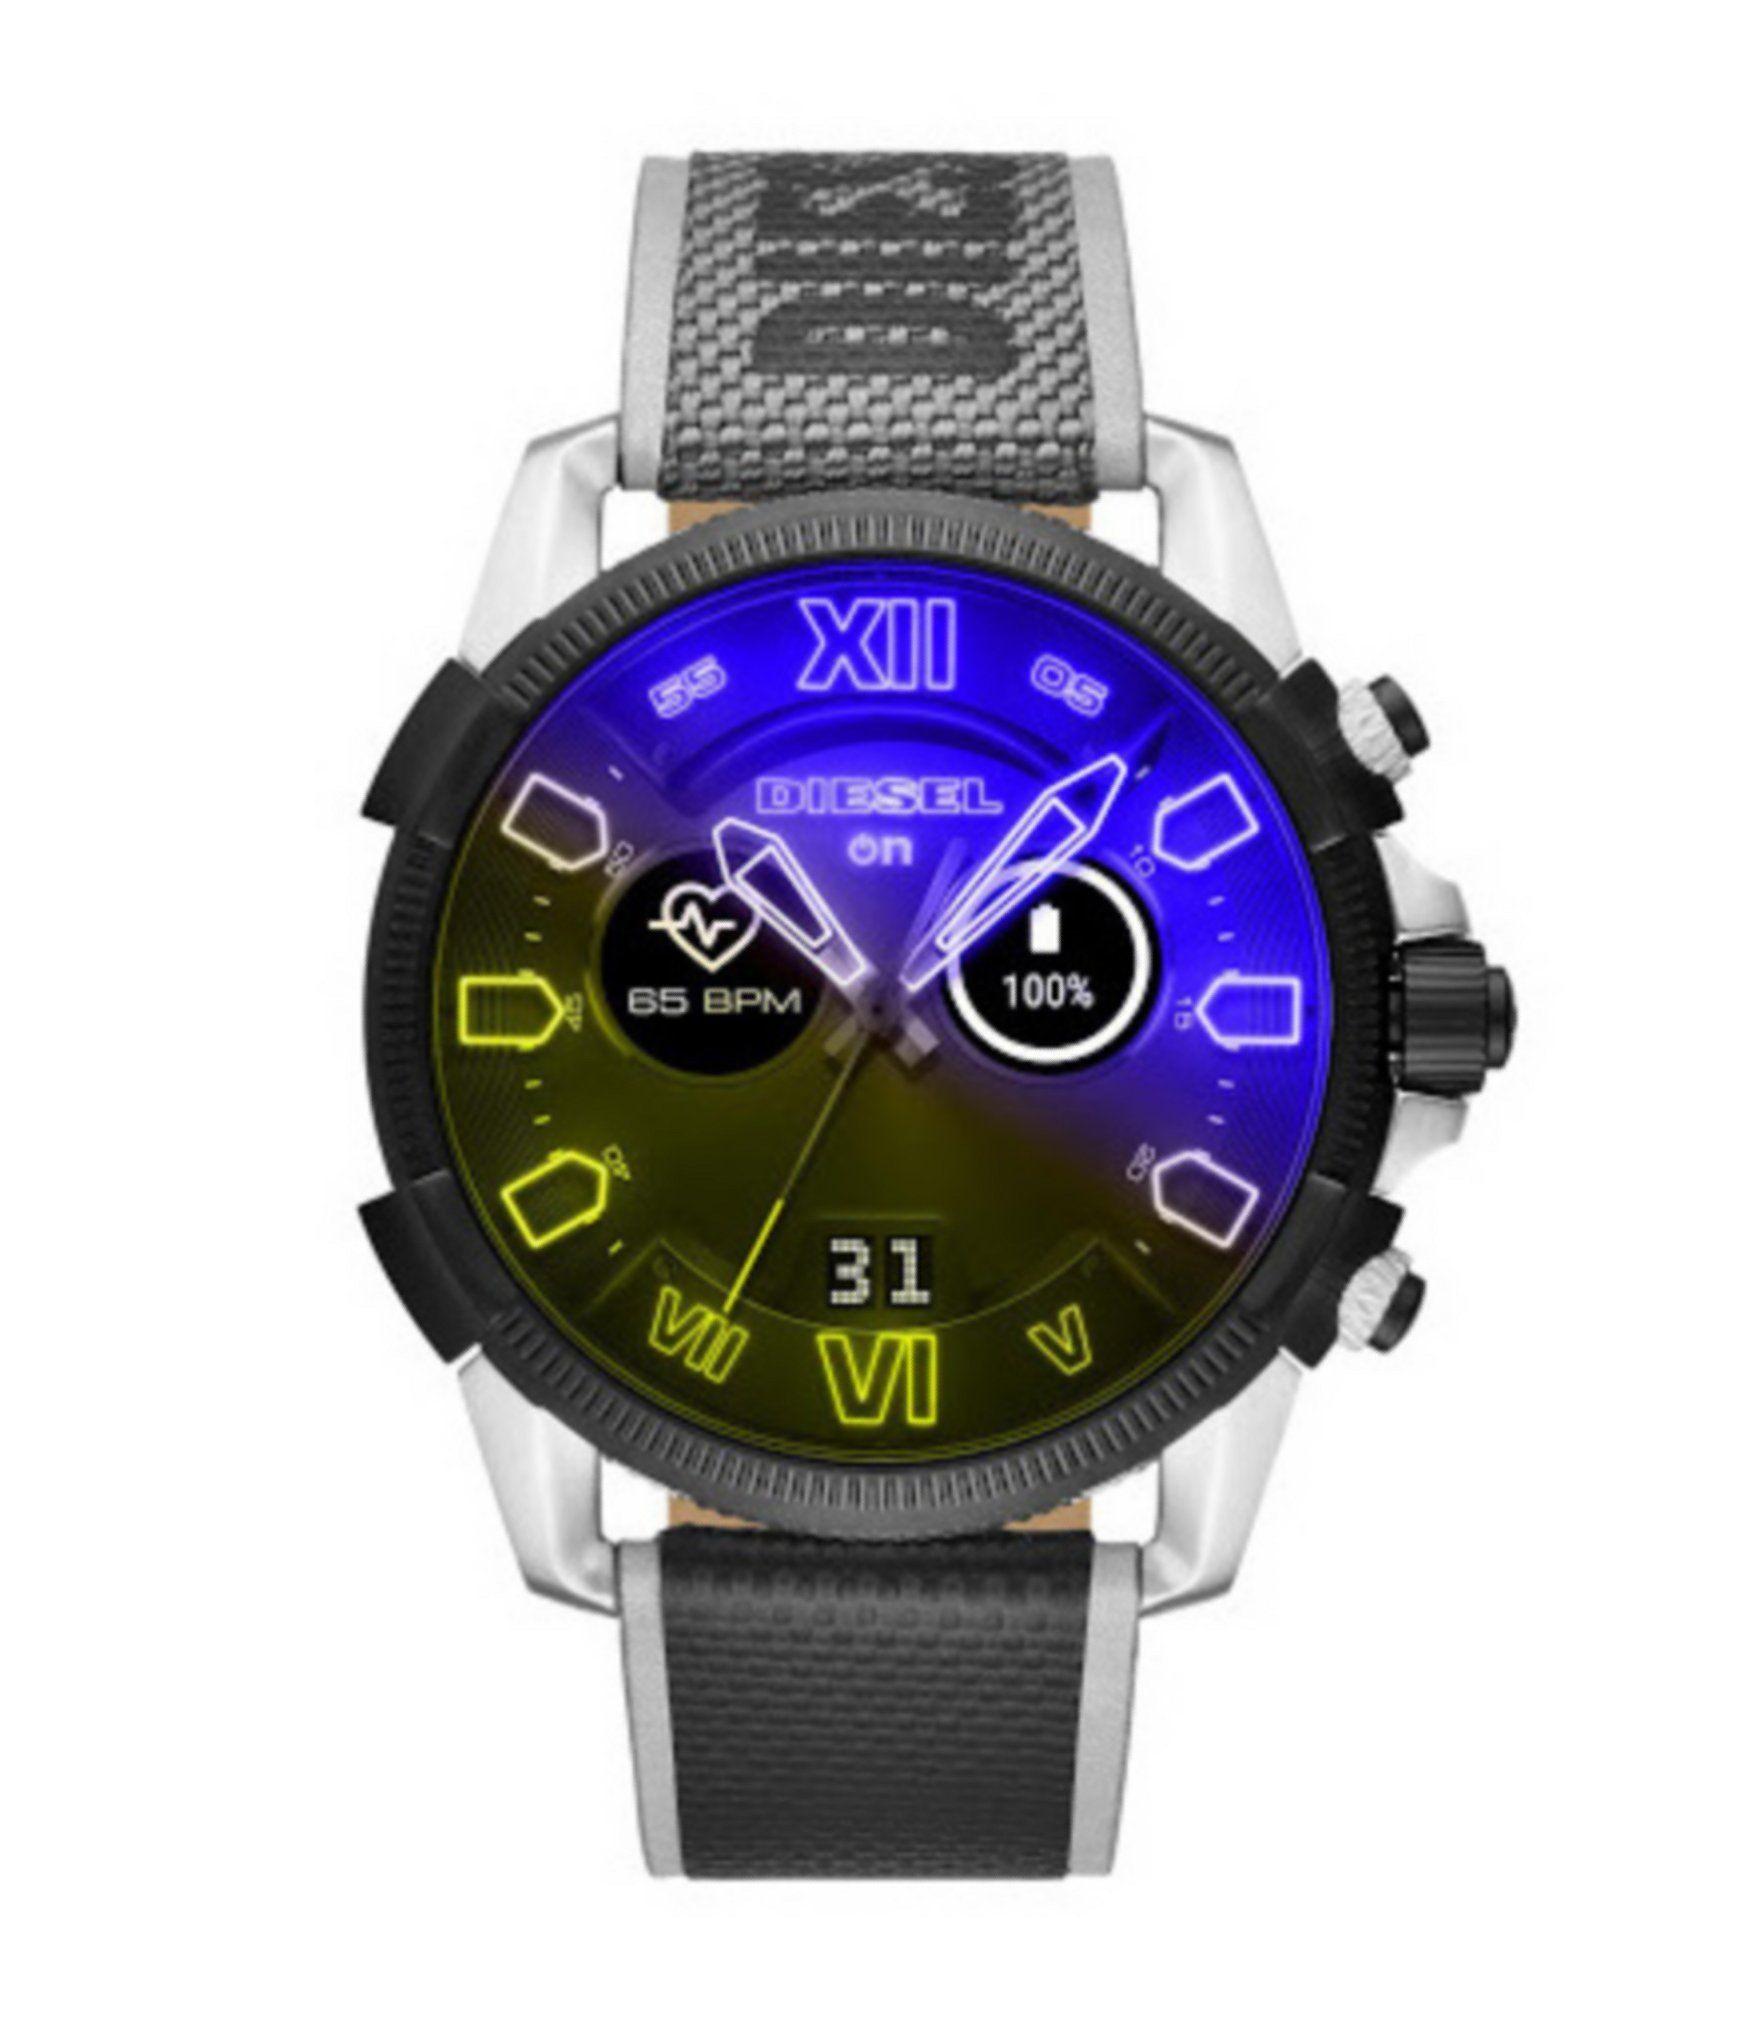 Diesel Full Guard 2 5 Touchscreen Smartwatch Black N A Diesel Watch Bands Smartwatch Features